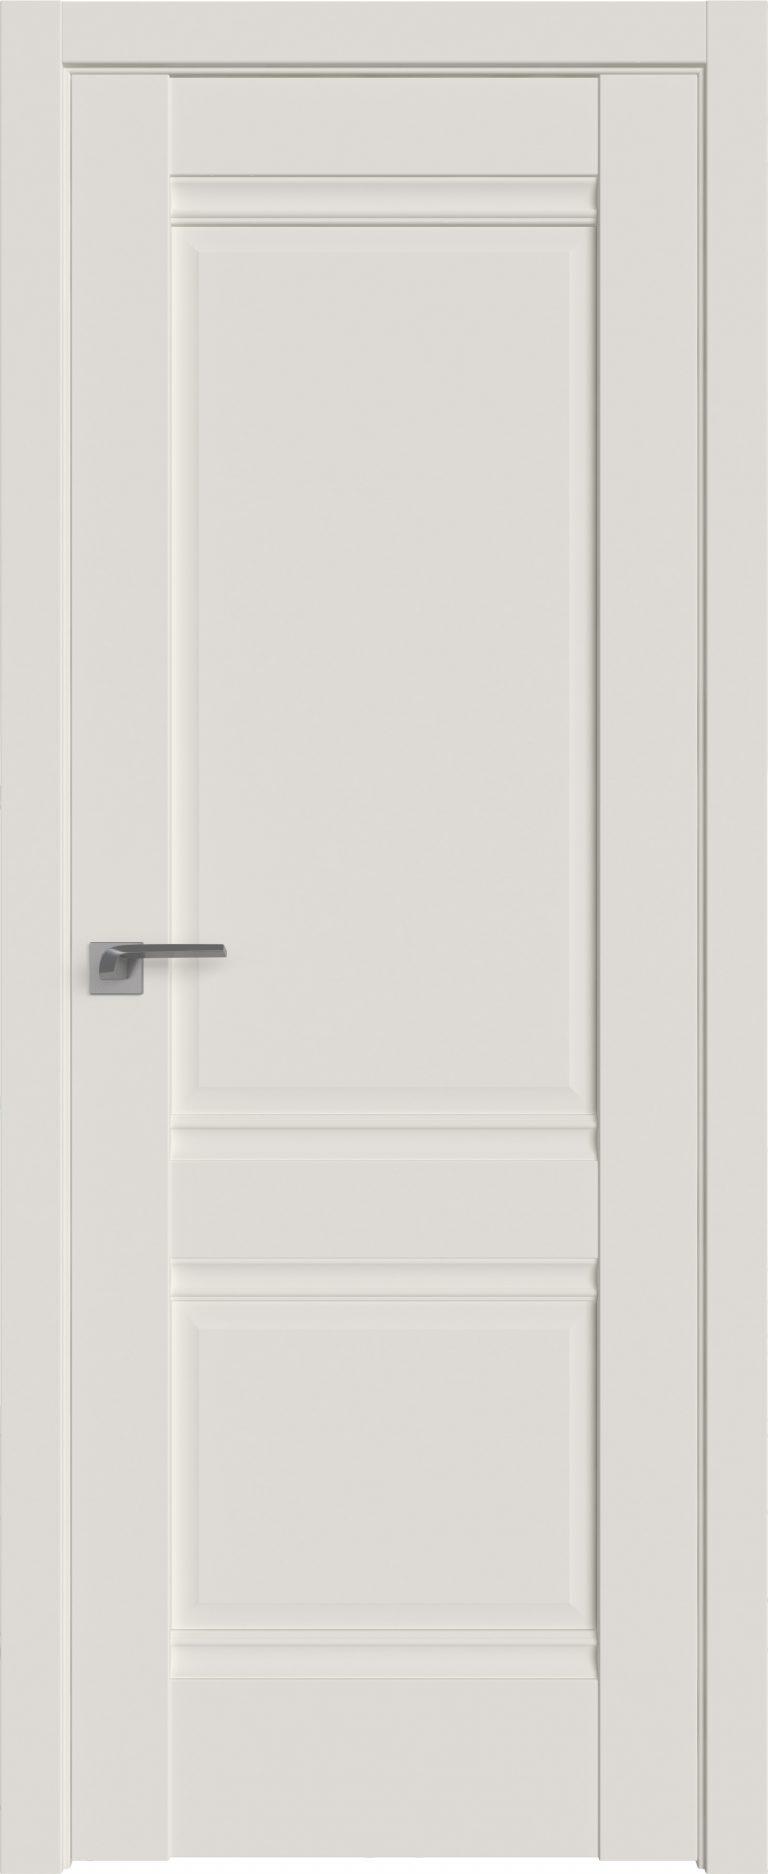 Межкомнатная дверь Profildoors 1U ДаркВайт